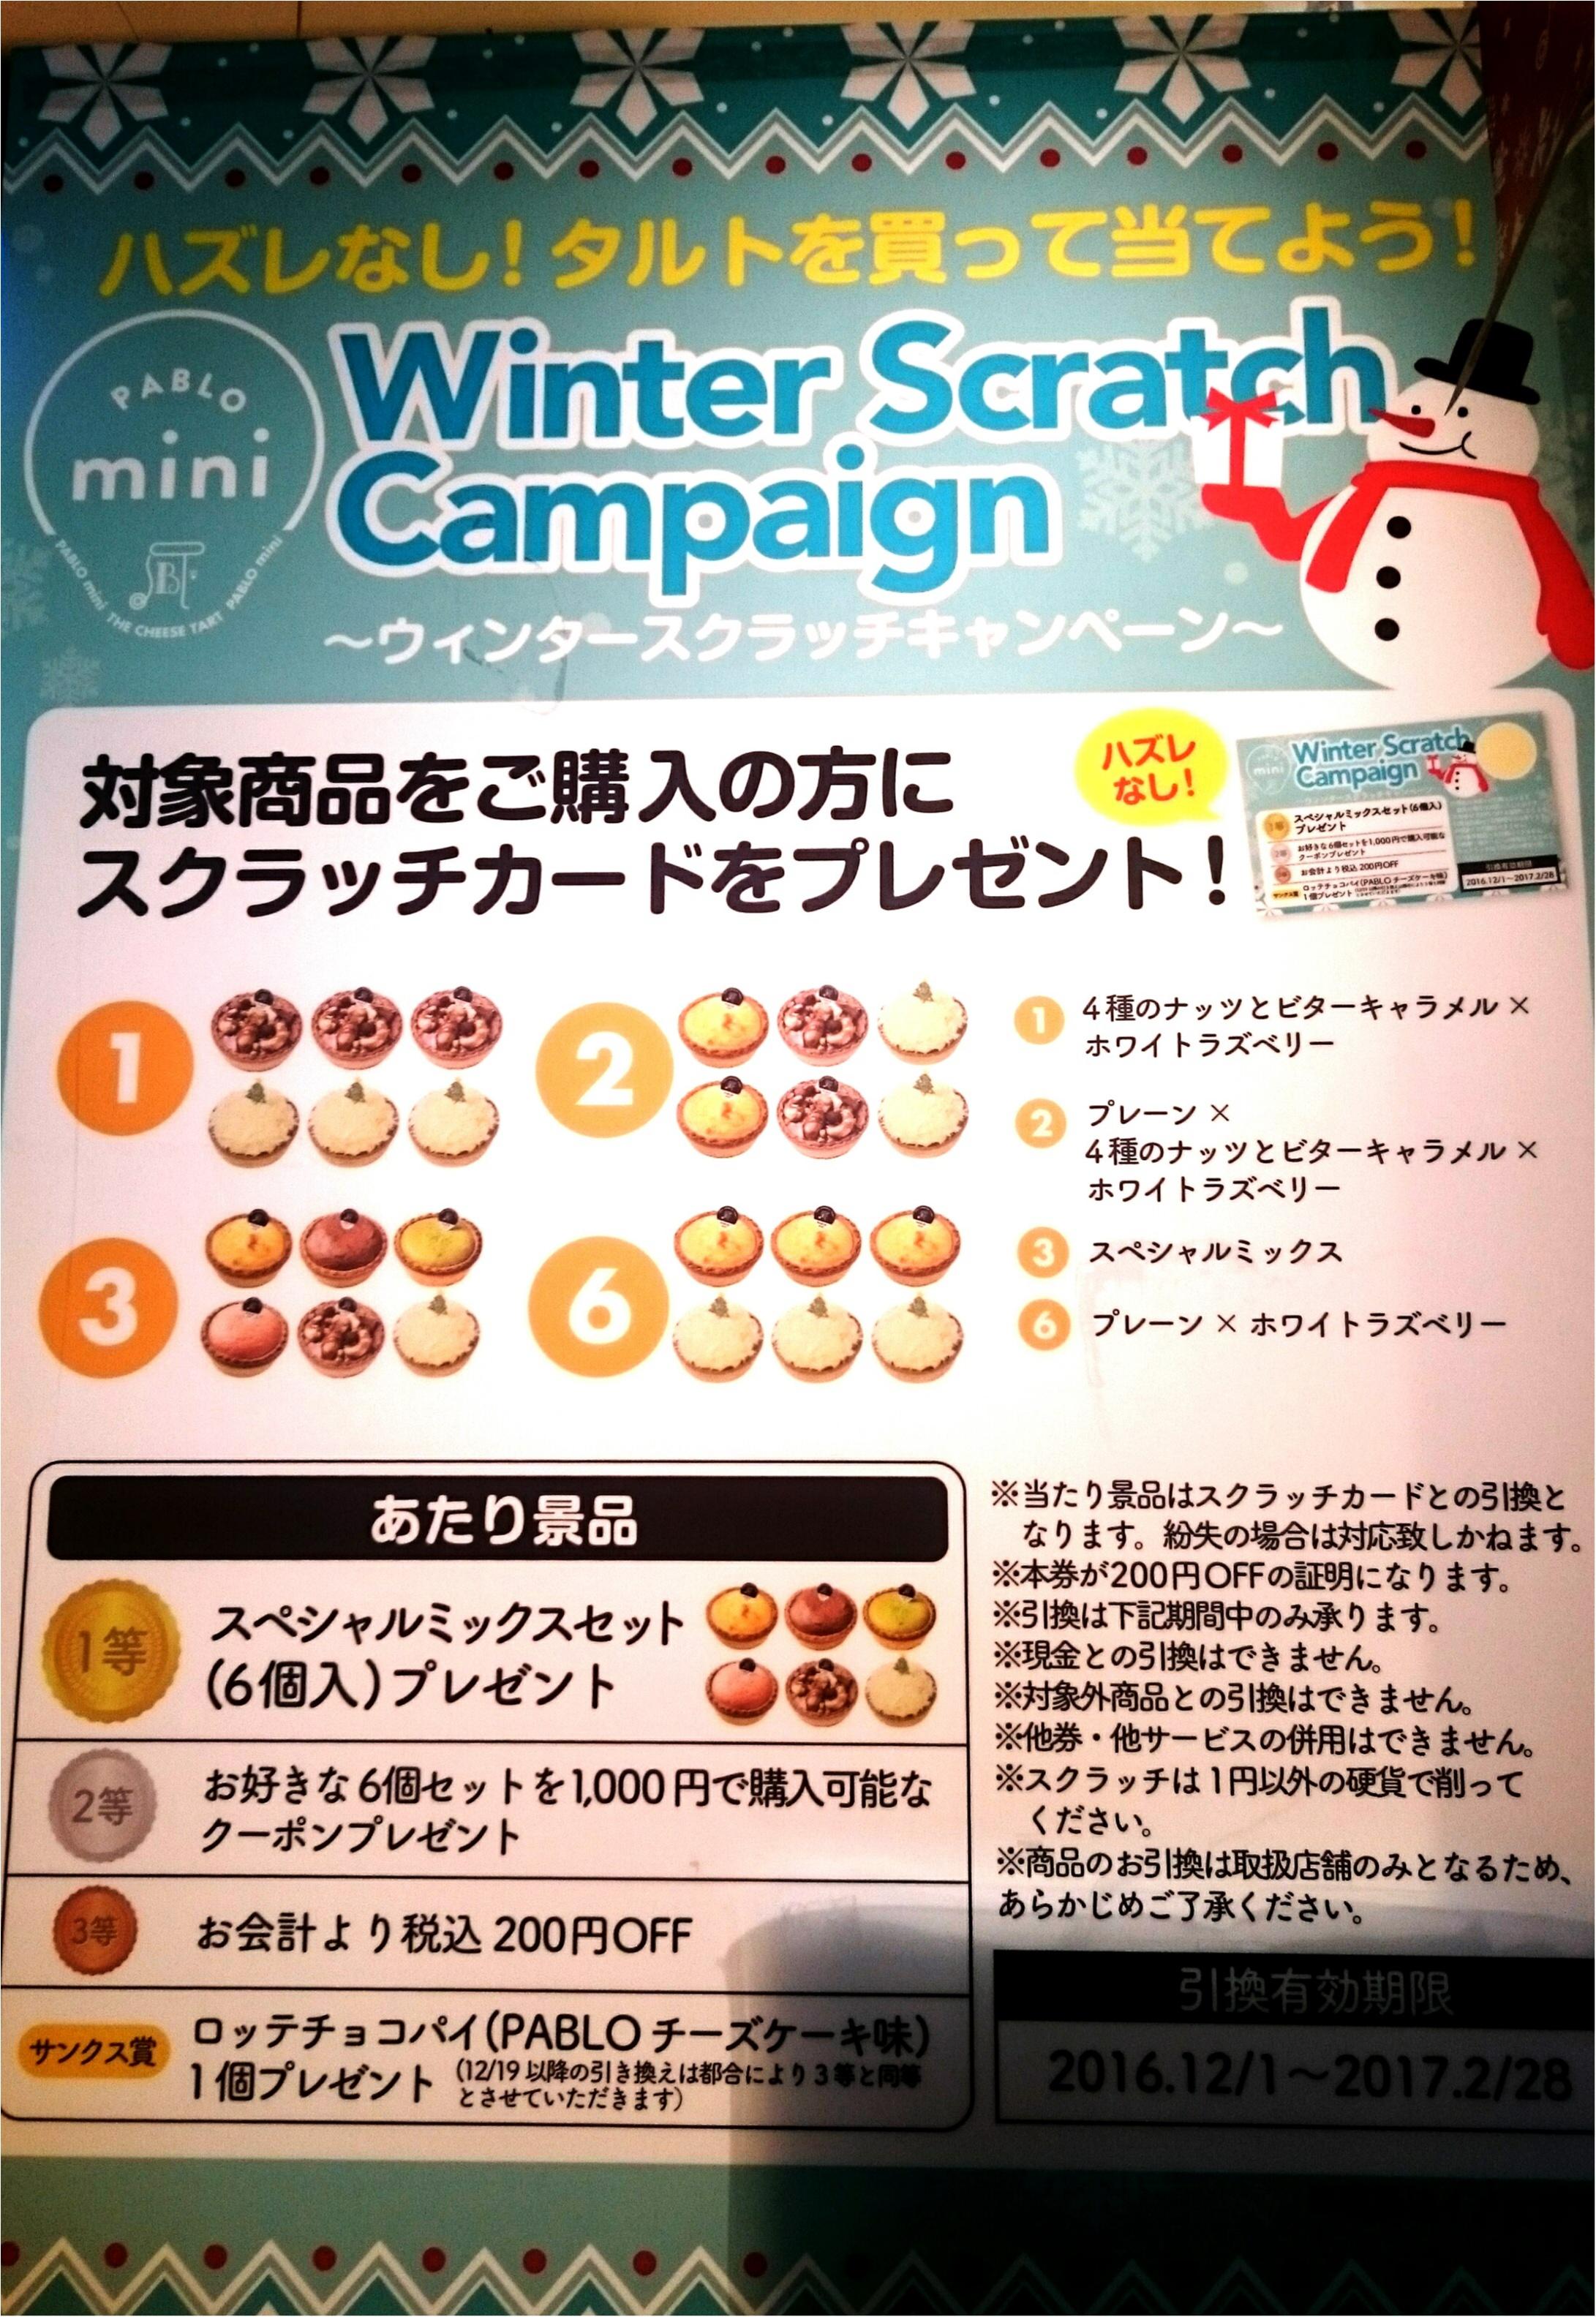 ☆PABLO miniでスタッフ一押しのSpecial Mixを購入☆_17